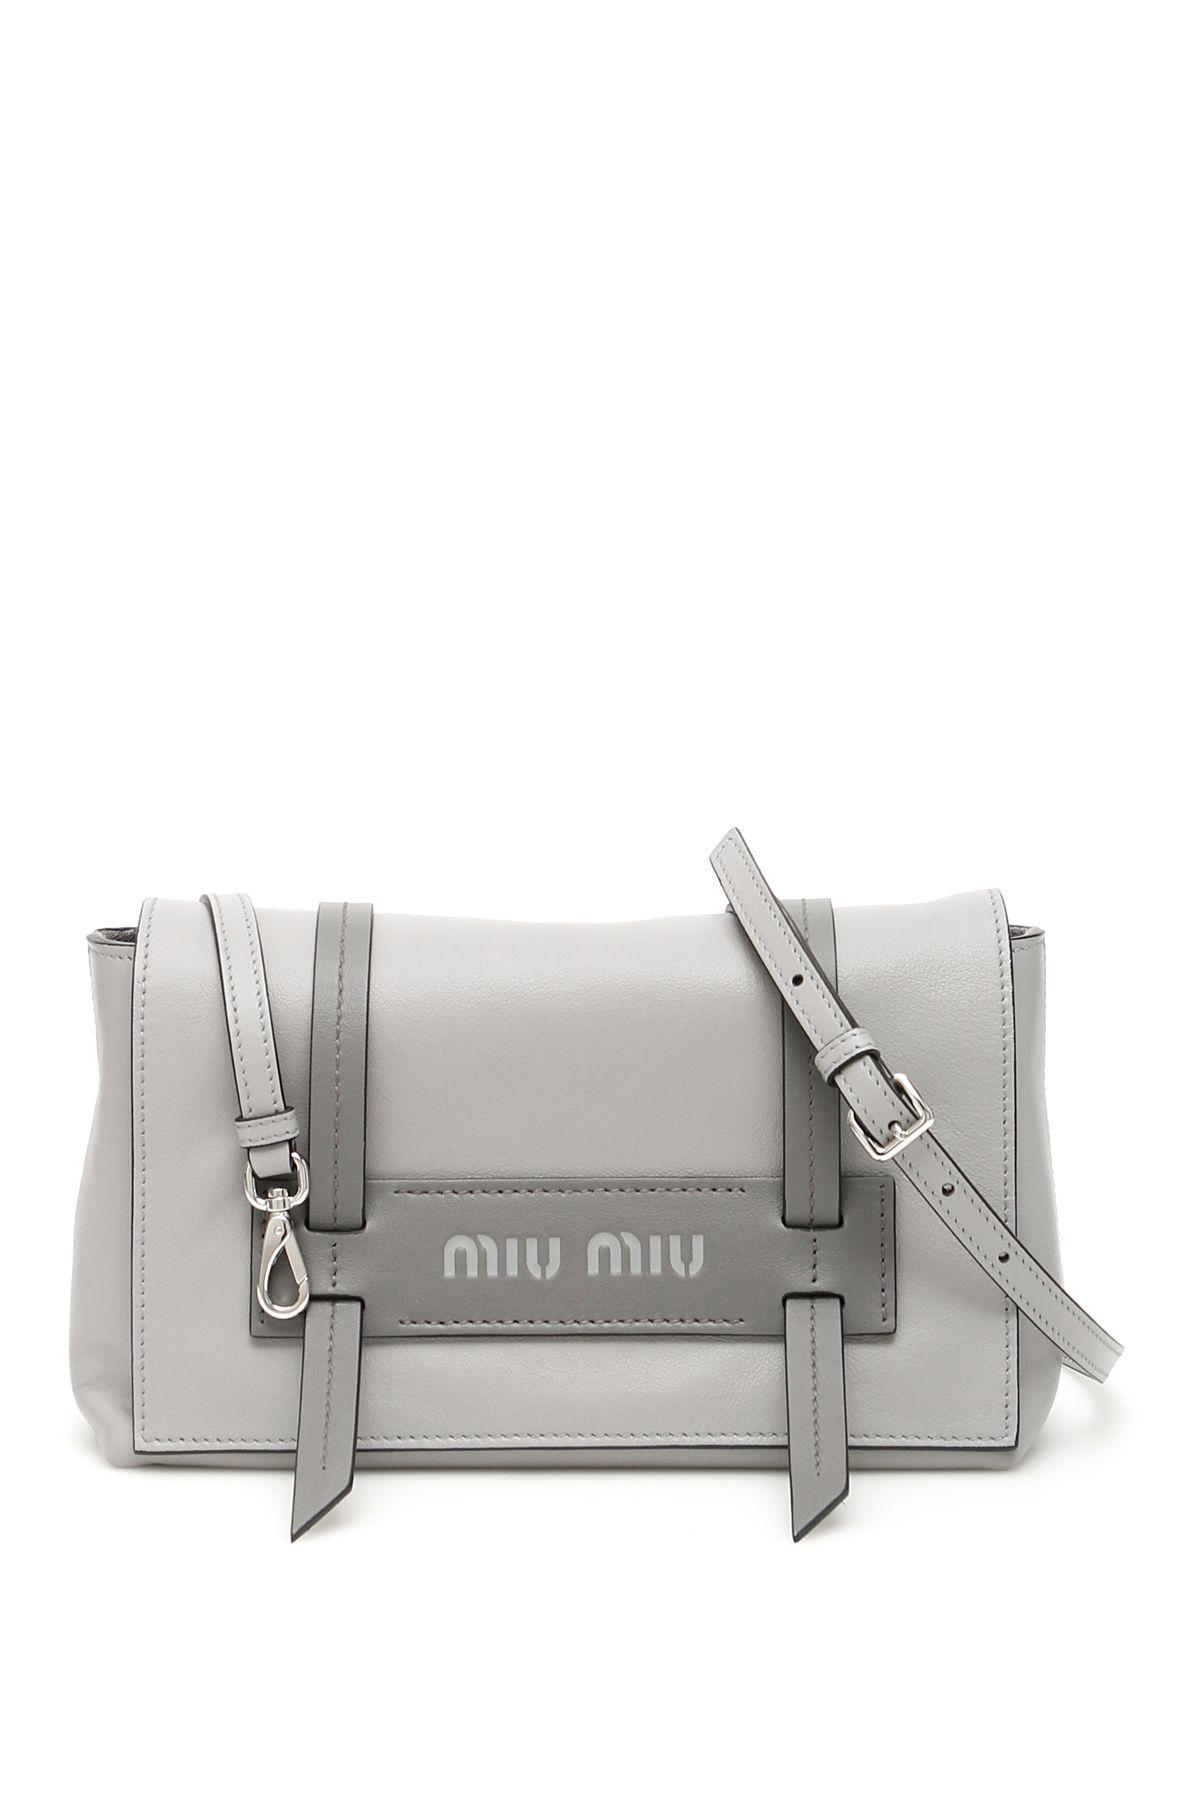 Miu Miu Logo Bag